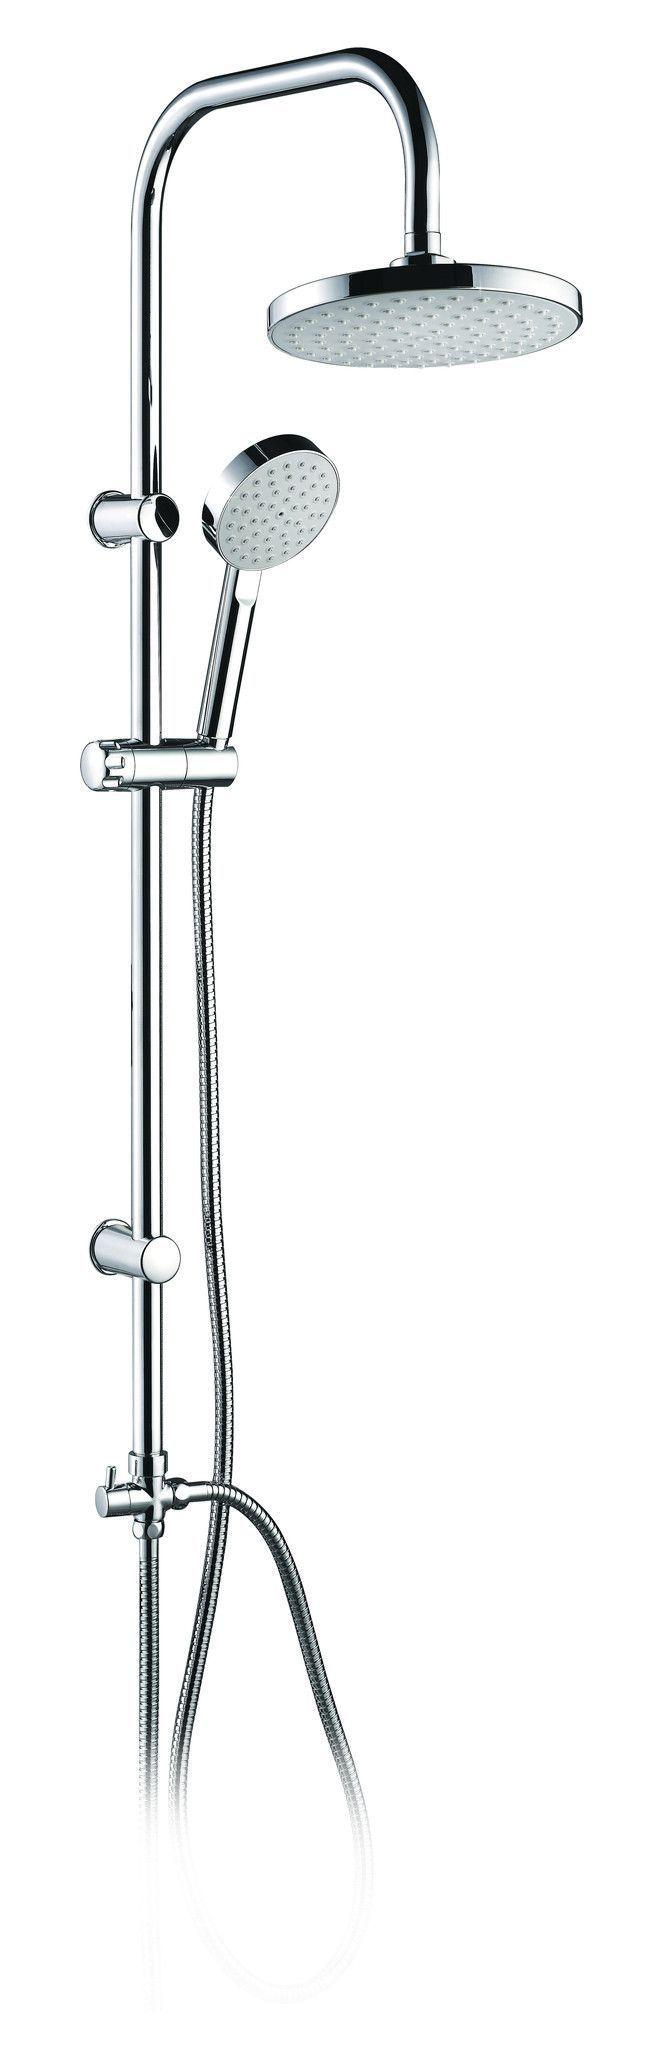 Miro Lago Shower System Column W/ Shower Head & Hand Held shower Polished Chrome